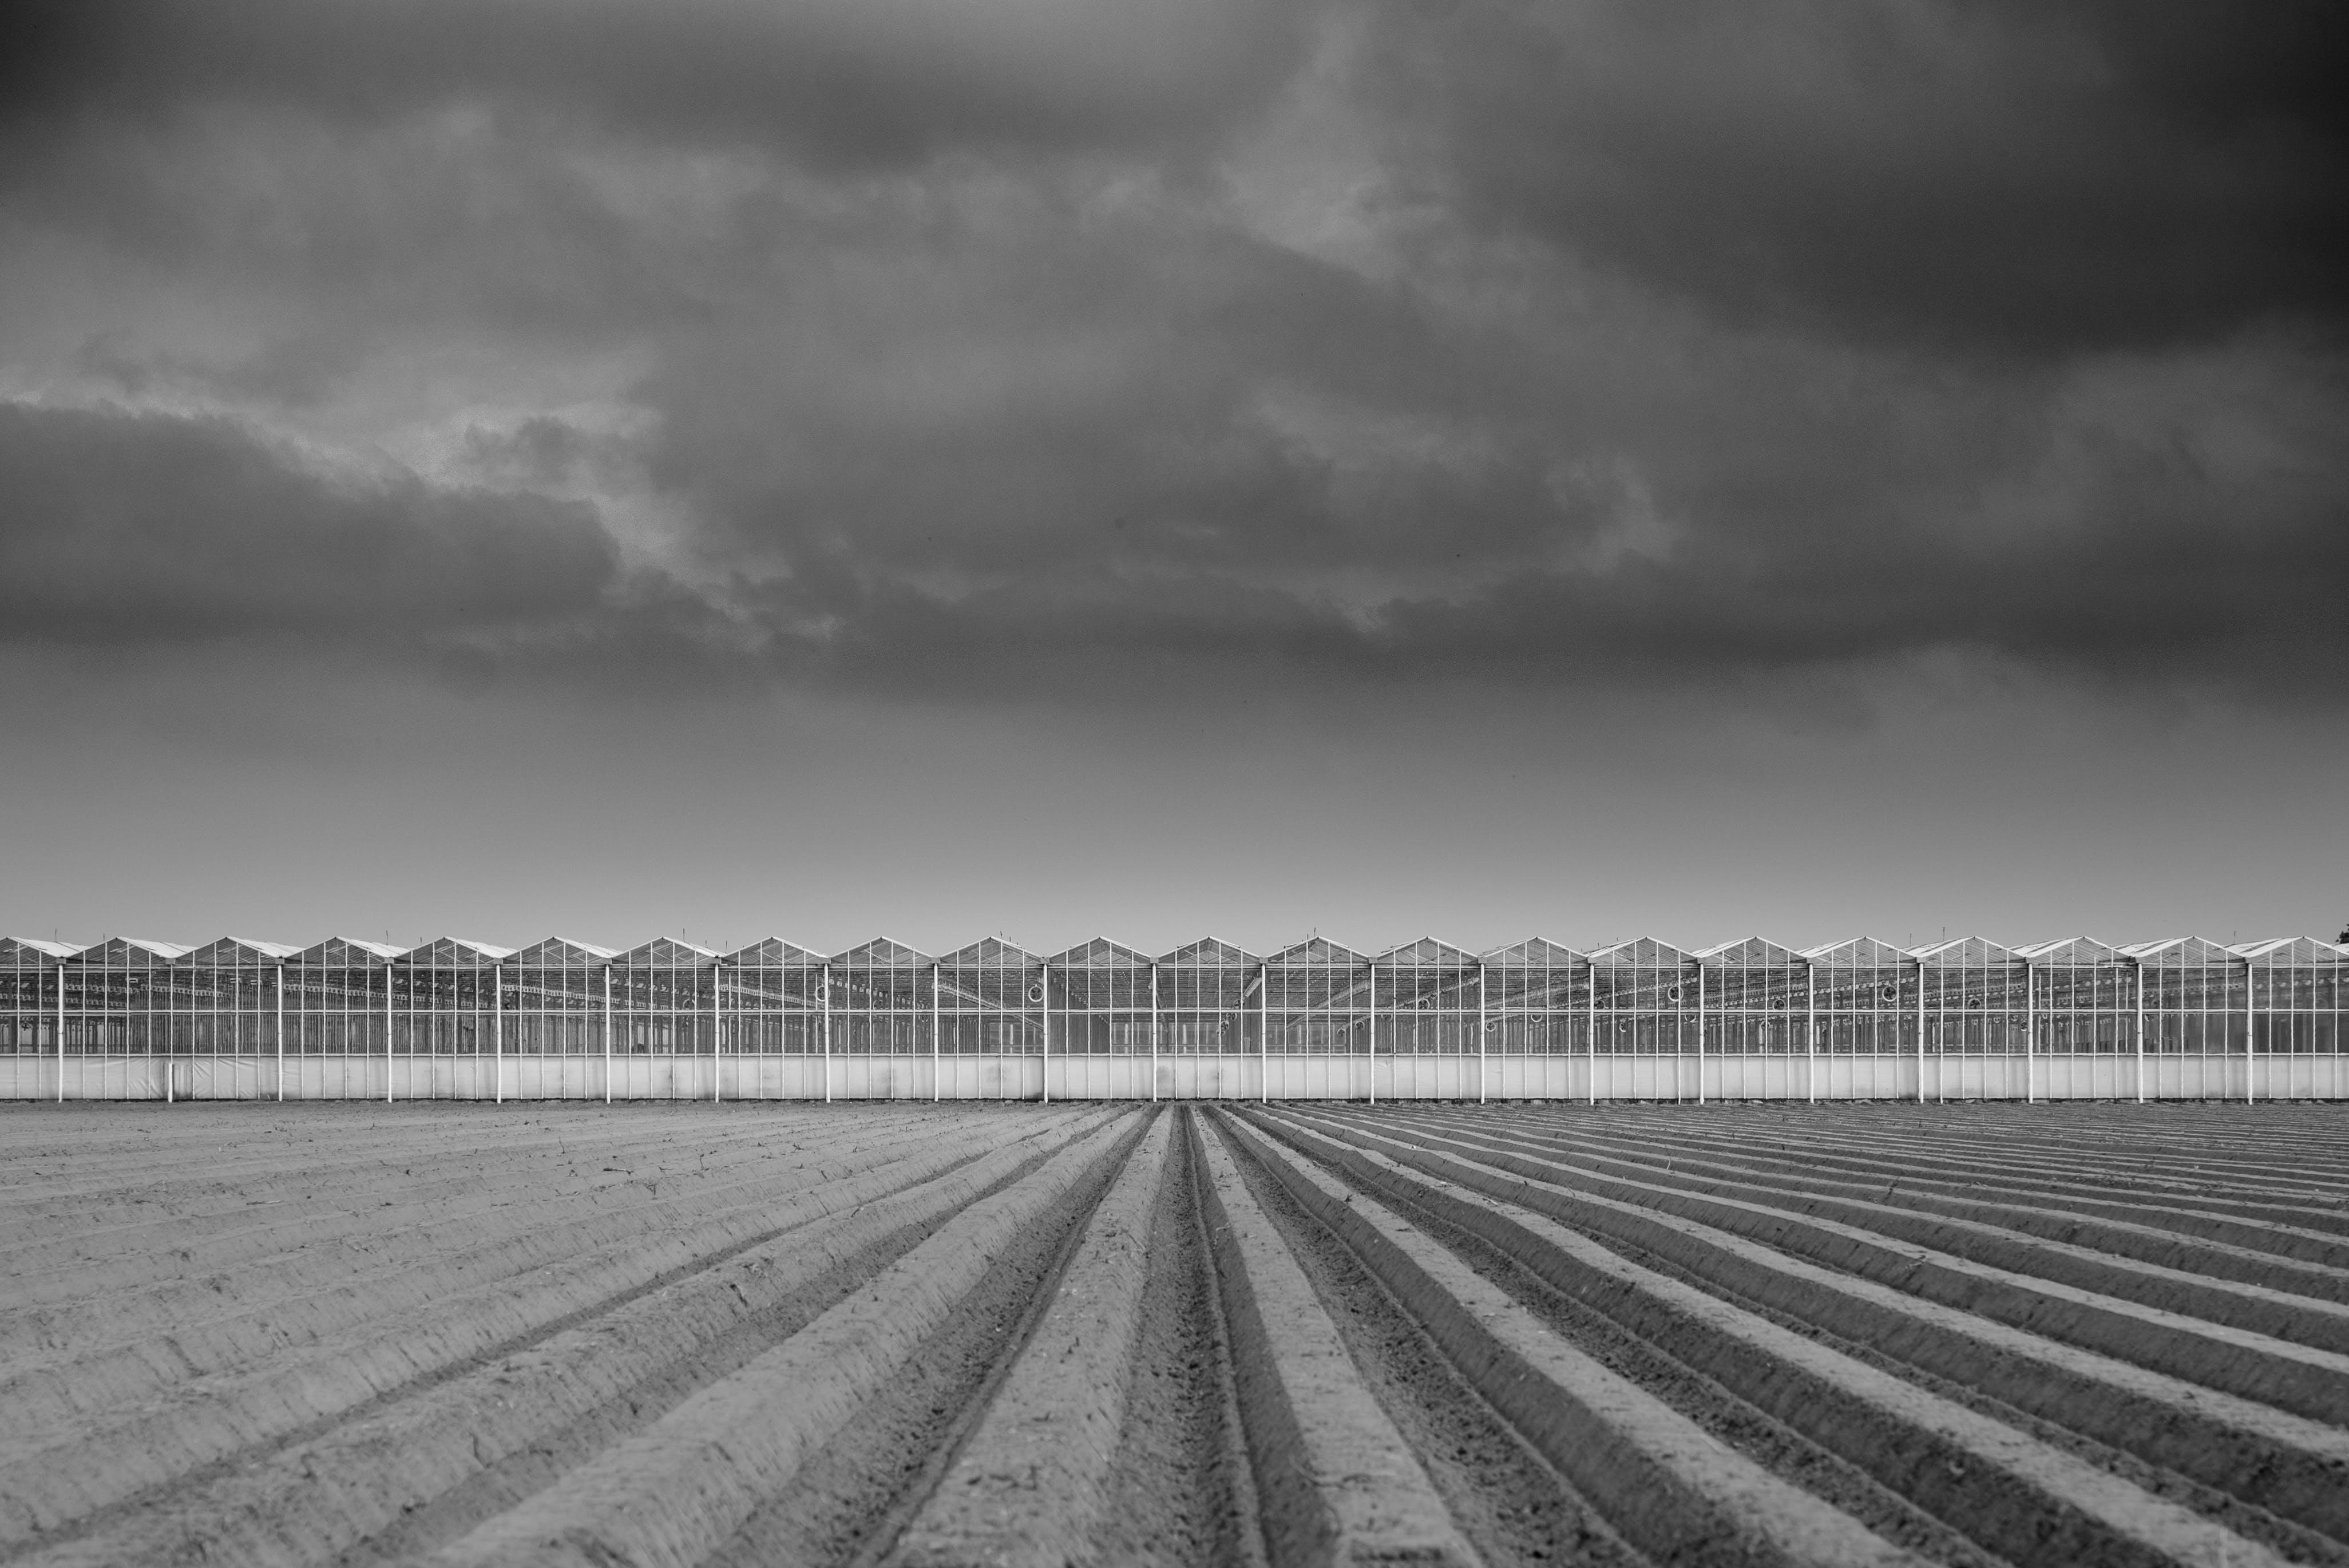 Grayscale Photograph of Farm